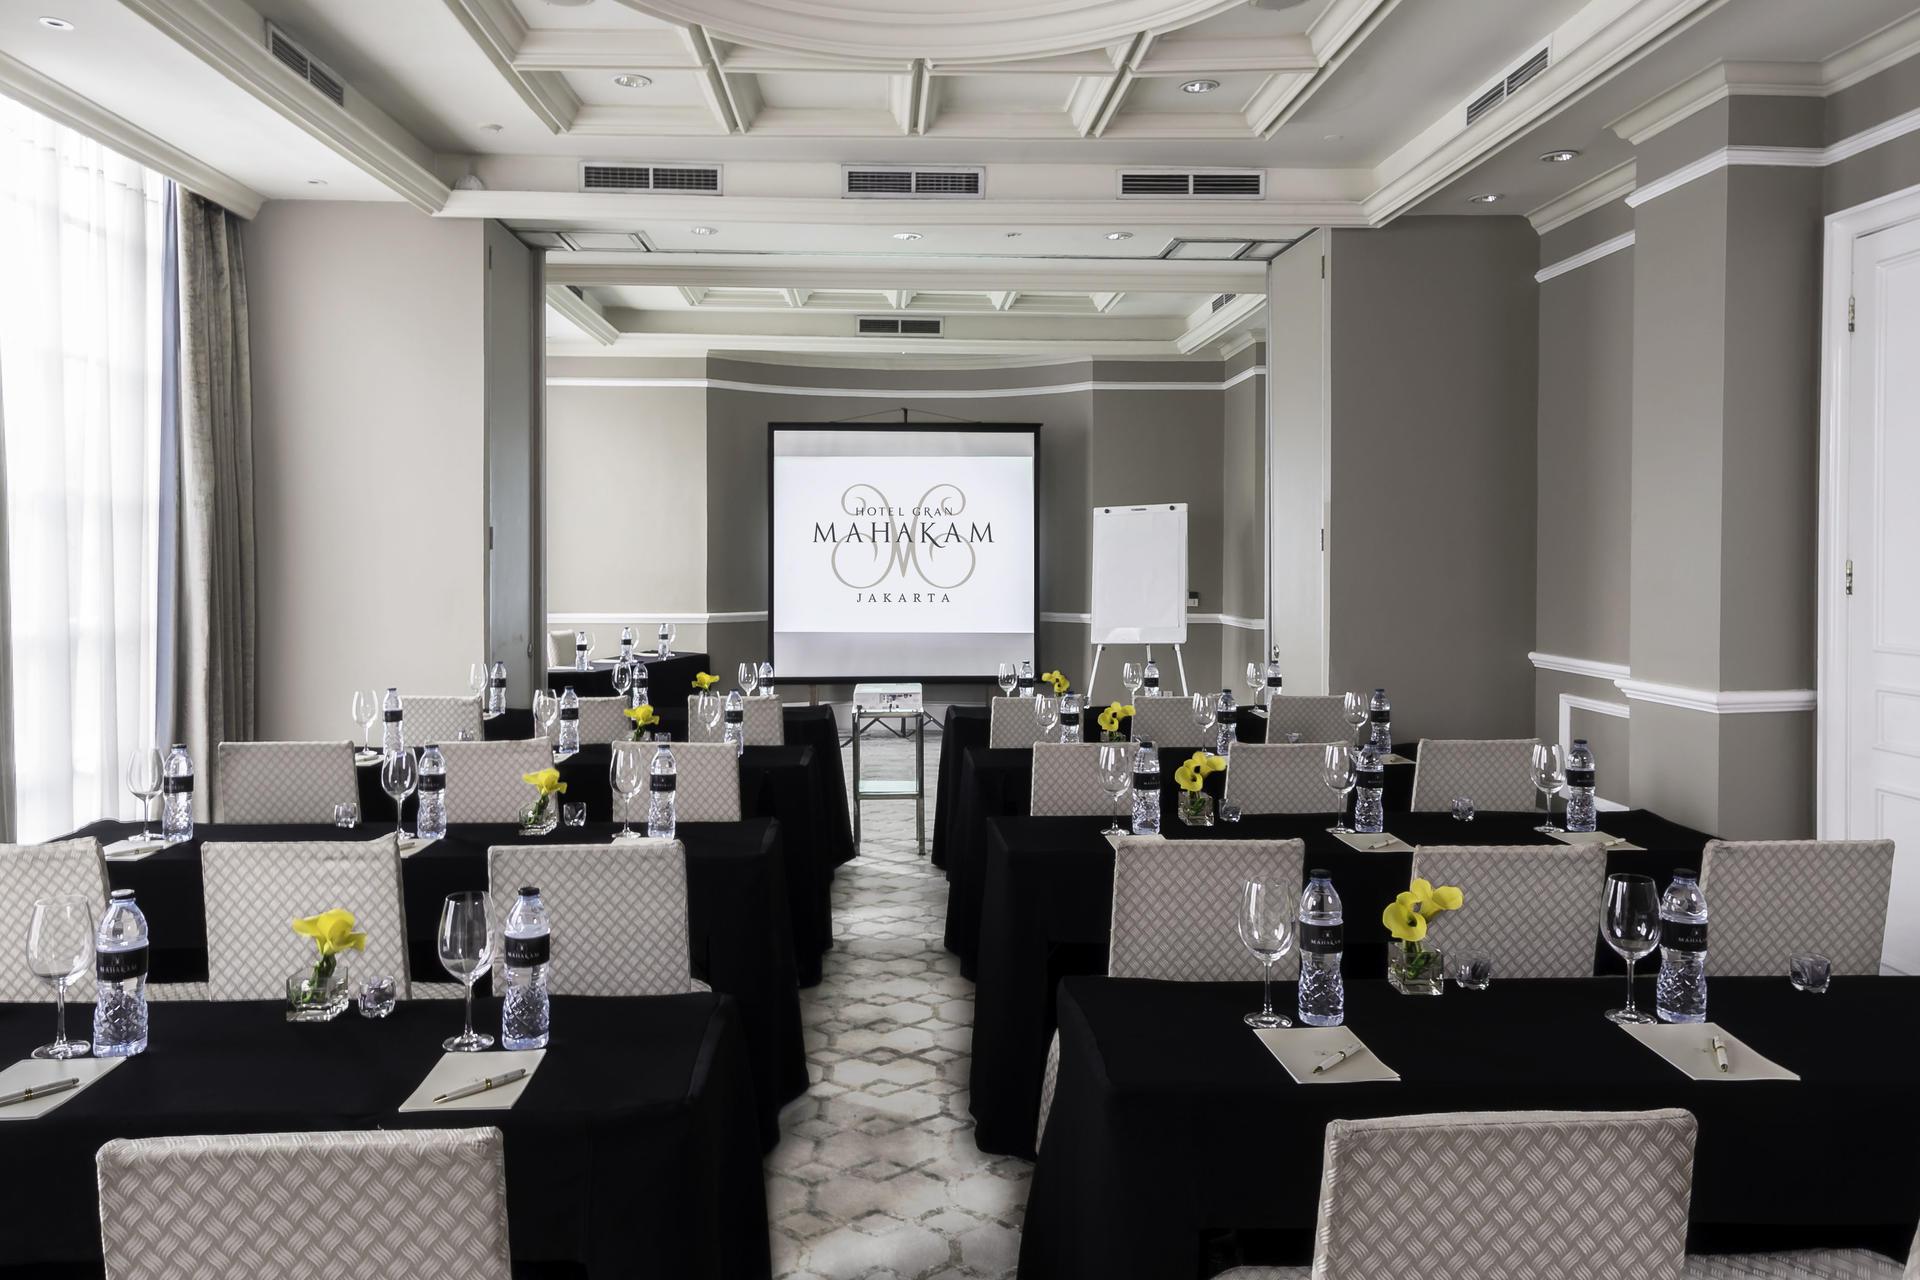 Meetings at Hotel Gran Mahakam in Jakarta, Indonesia